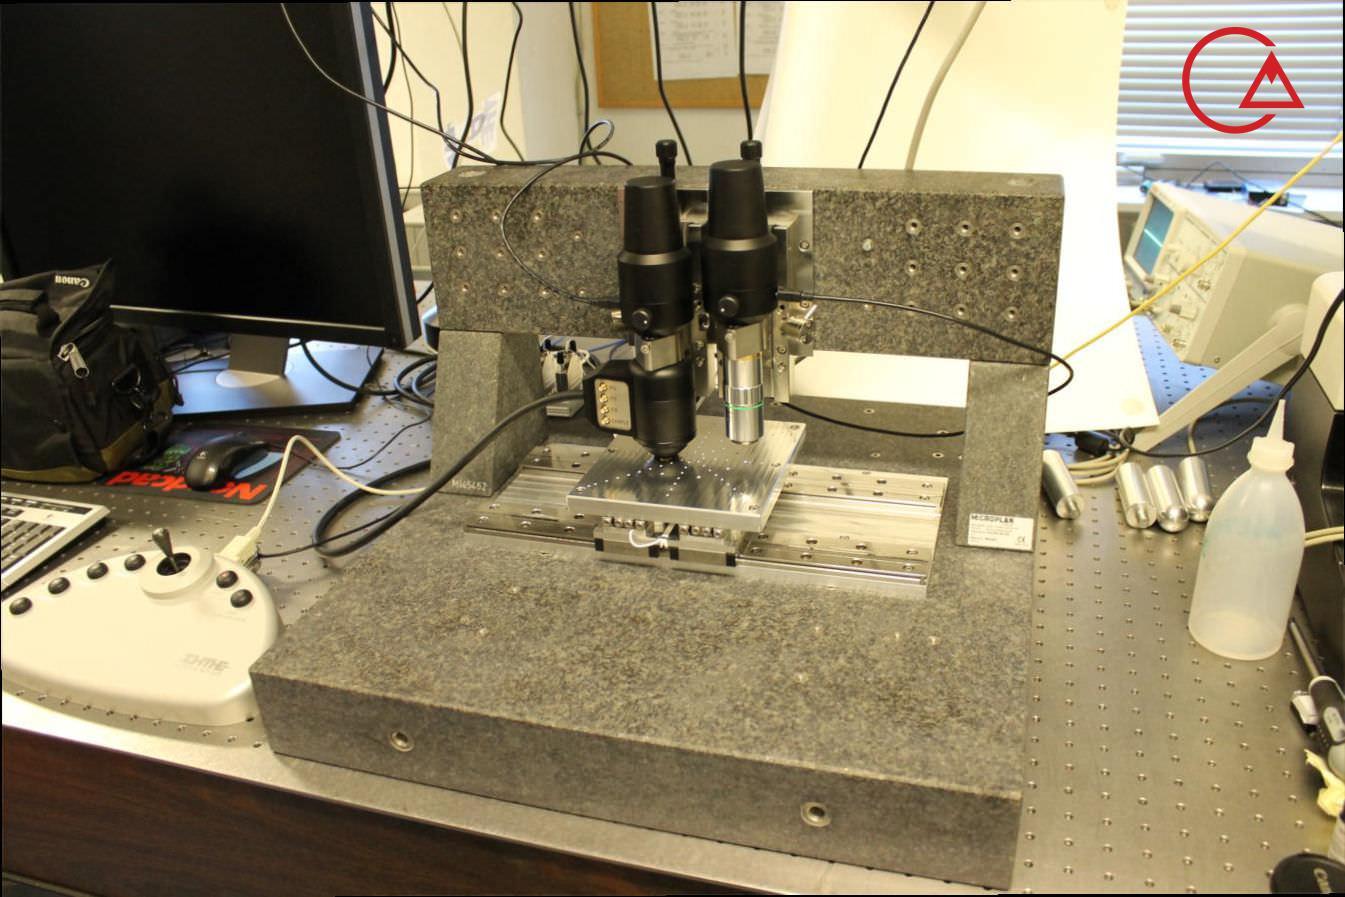 میکروسکوپ پروبی روبشی 2